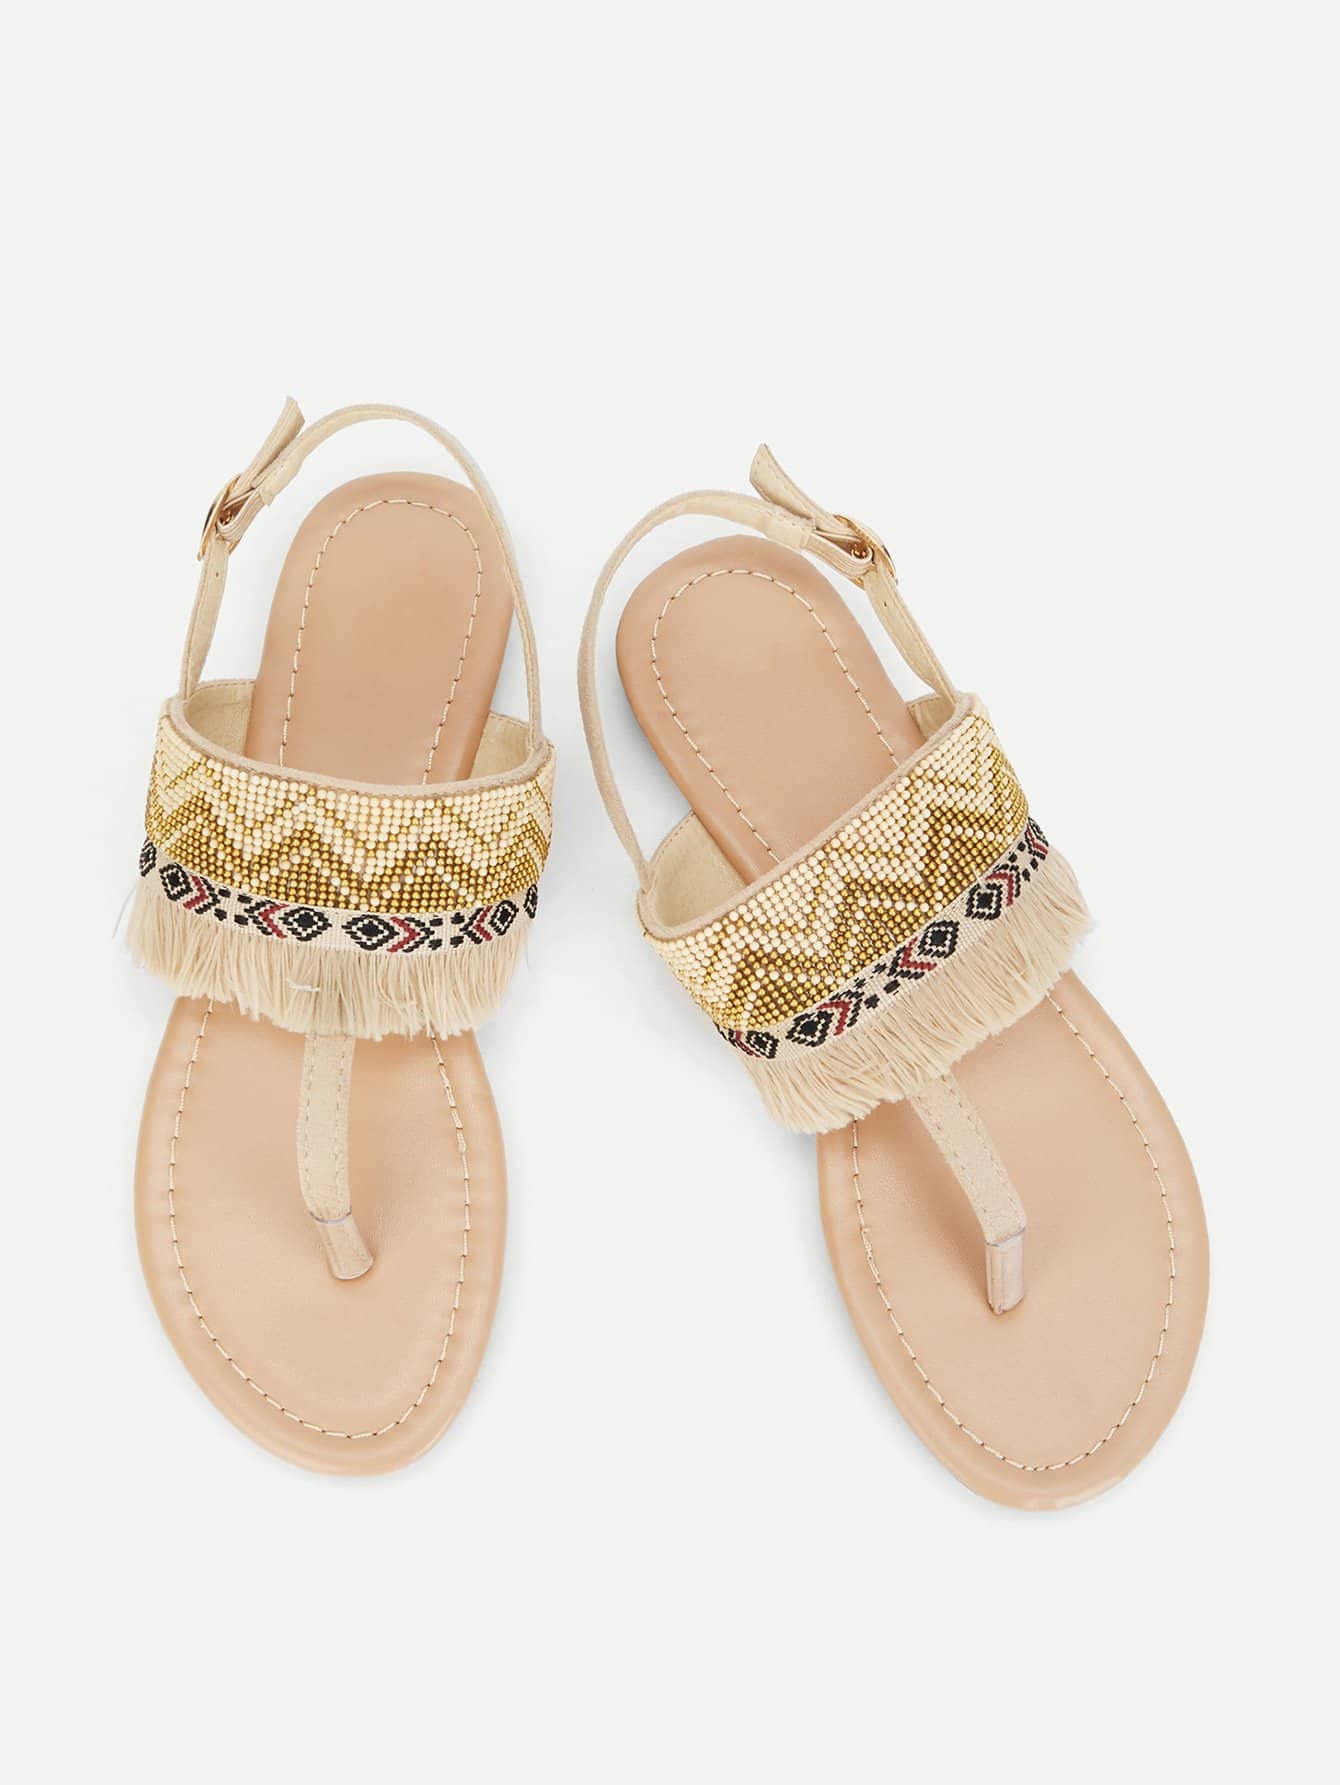 Fringe Detail Toe Post Sandals fringe detail beach sandals